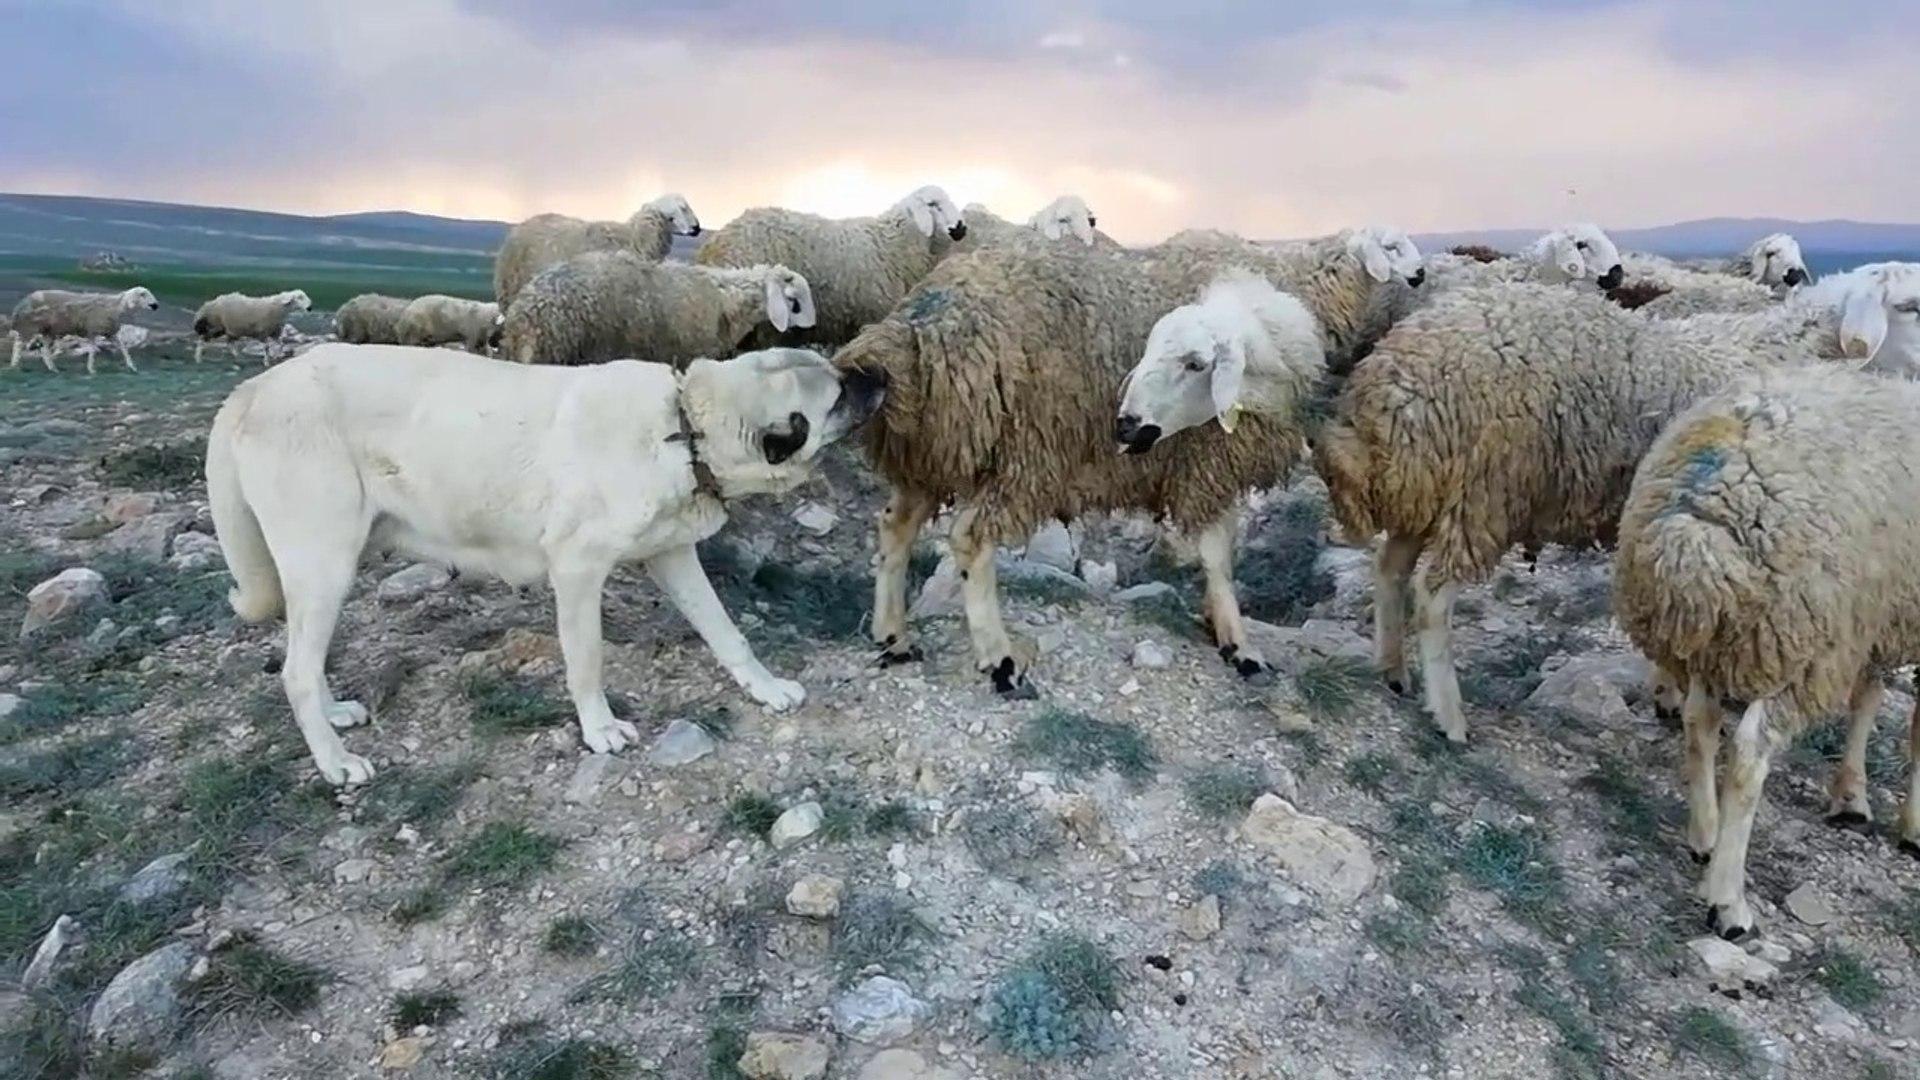 SiVAS KANGAL KOPEGiNiN BiT PiRE TEMiZLiGi - KaNGAL SHEPHERD DOG FLEA CLEANiNG